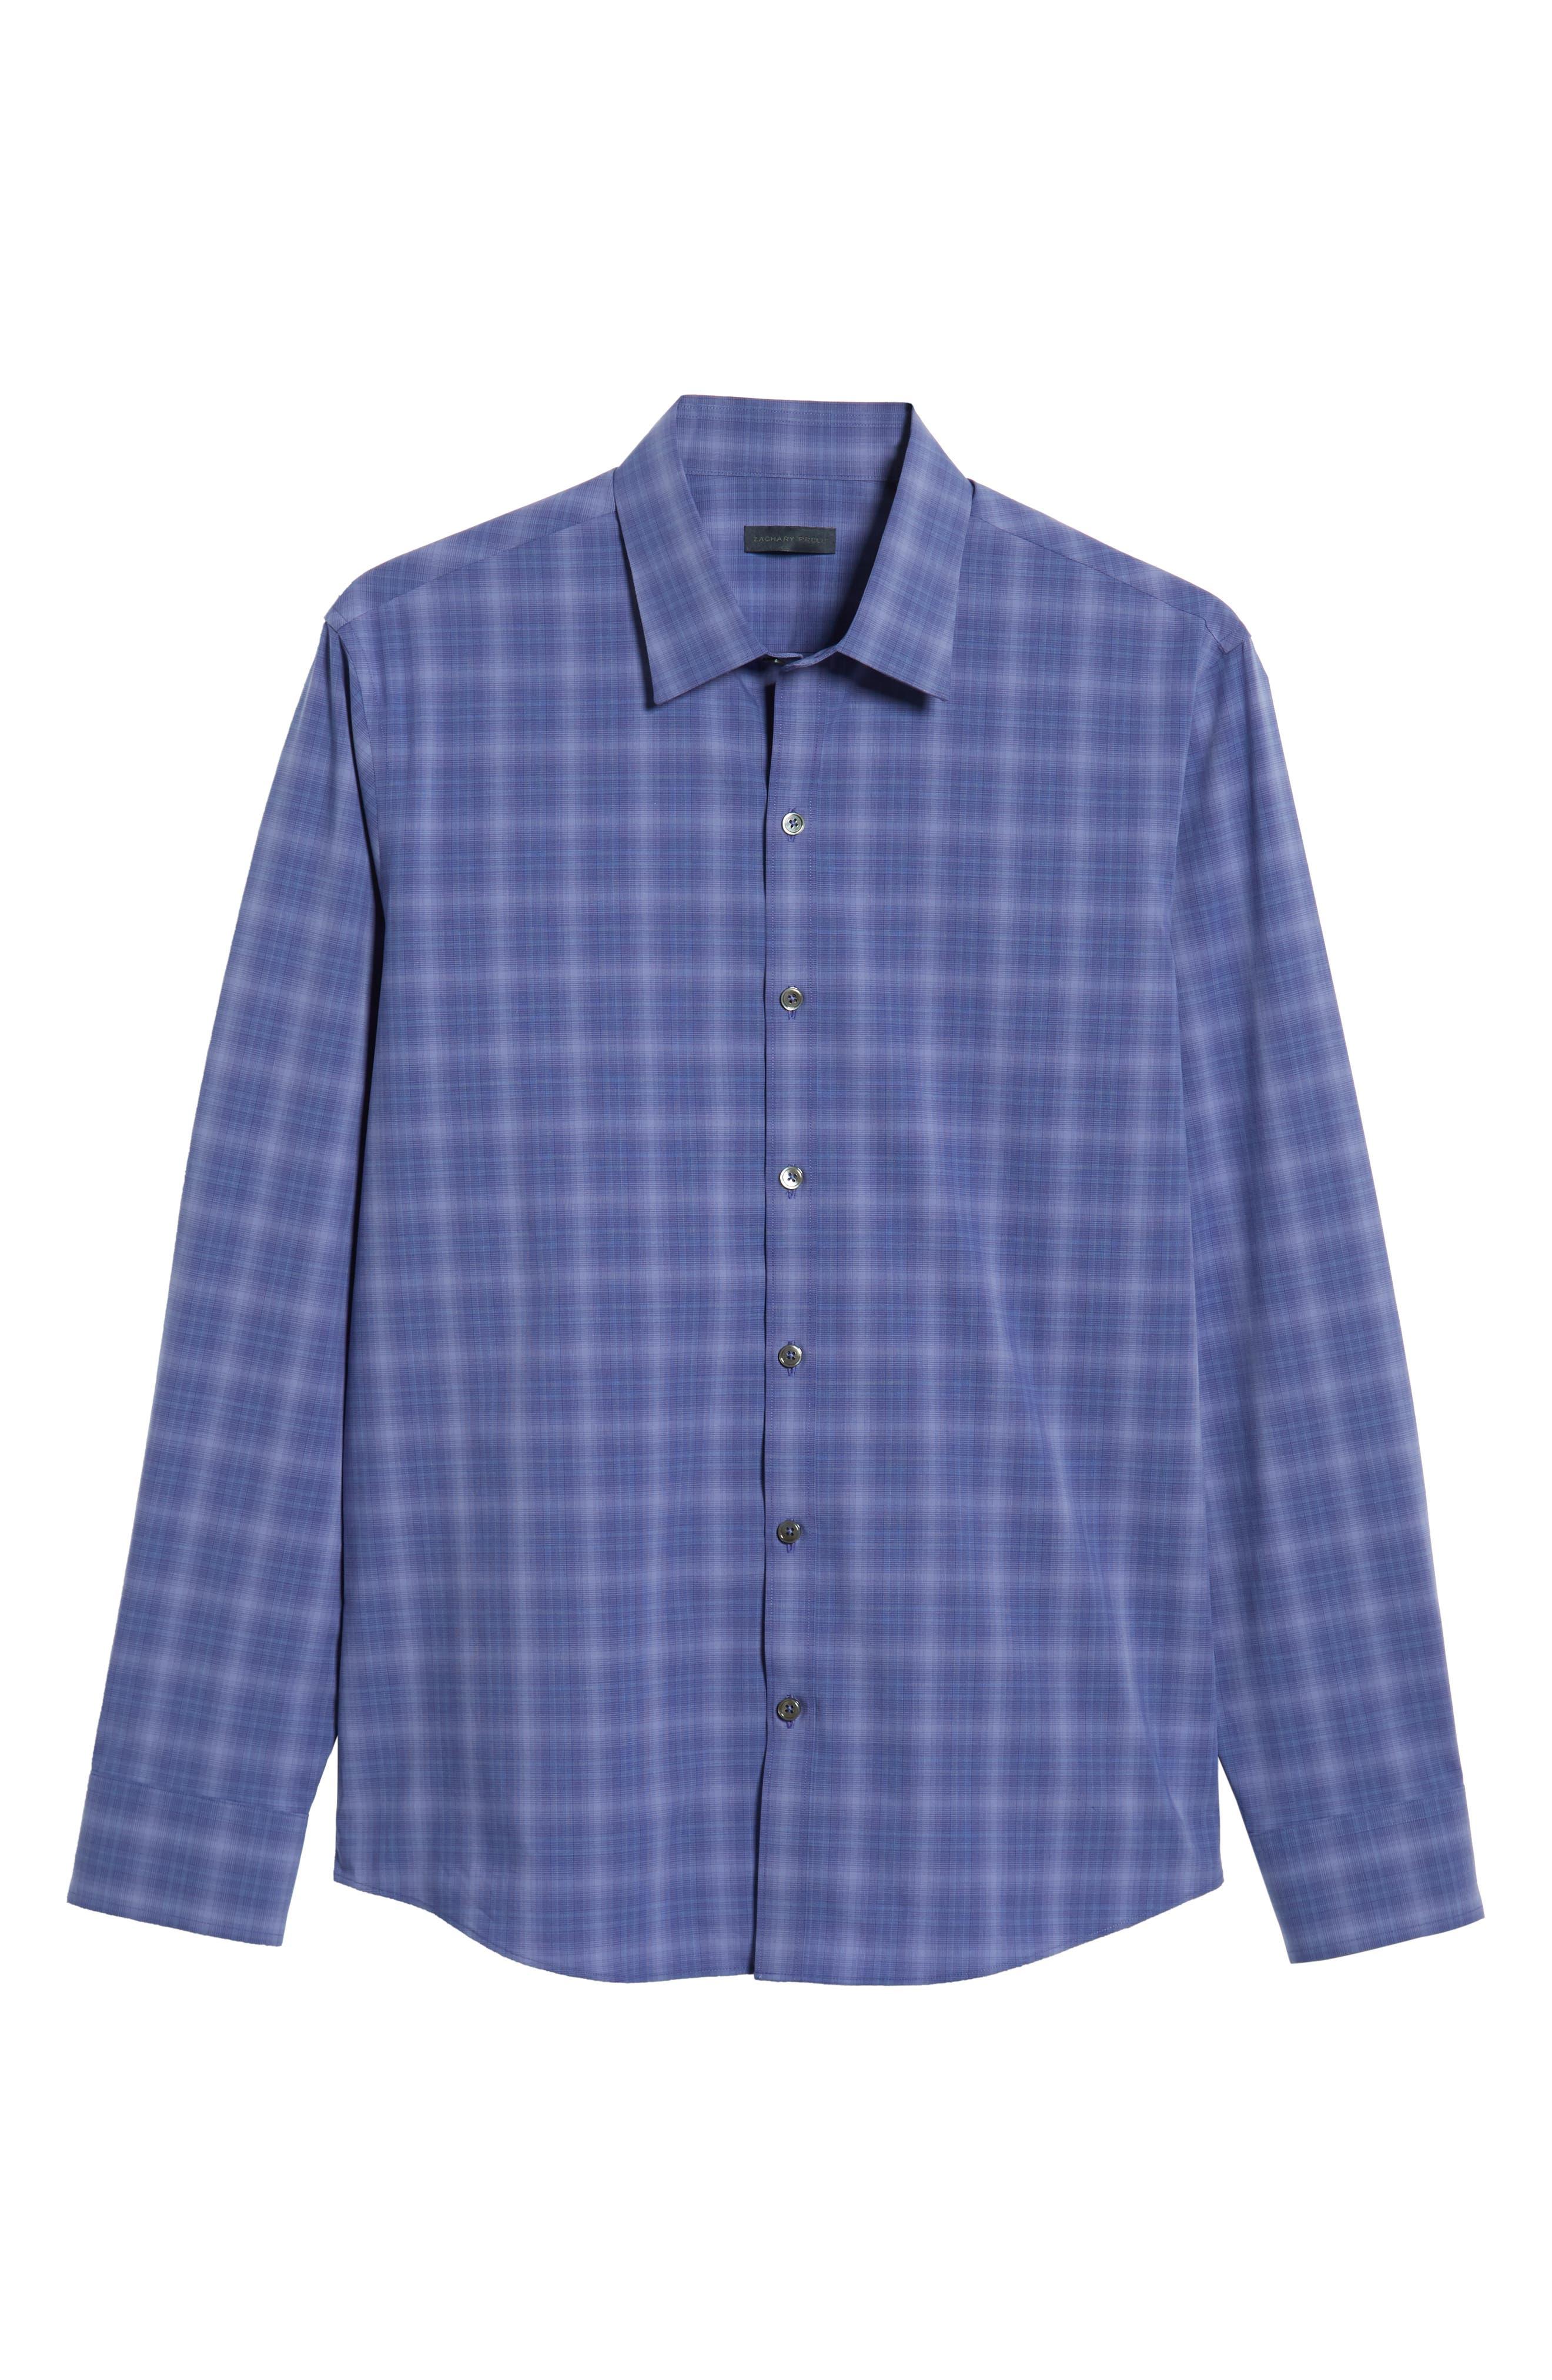 ZACHARY PRELL, Wandy Regular Fit Check Sport Shirt, Alternate thumbnail 5, color, LIGHT PURPLE